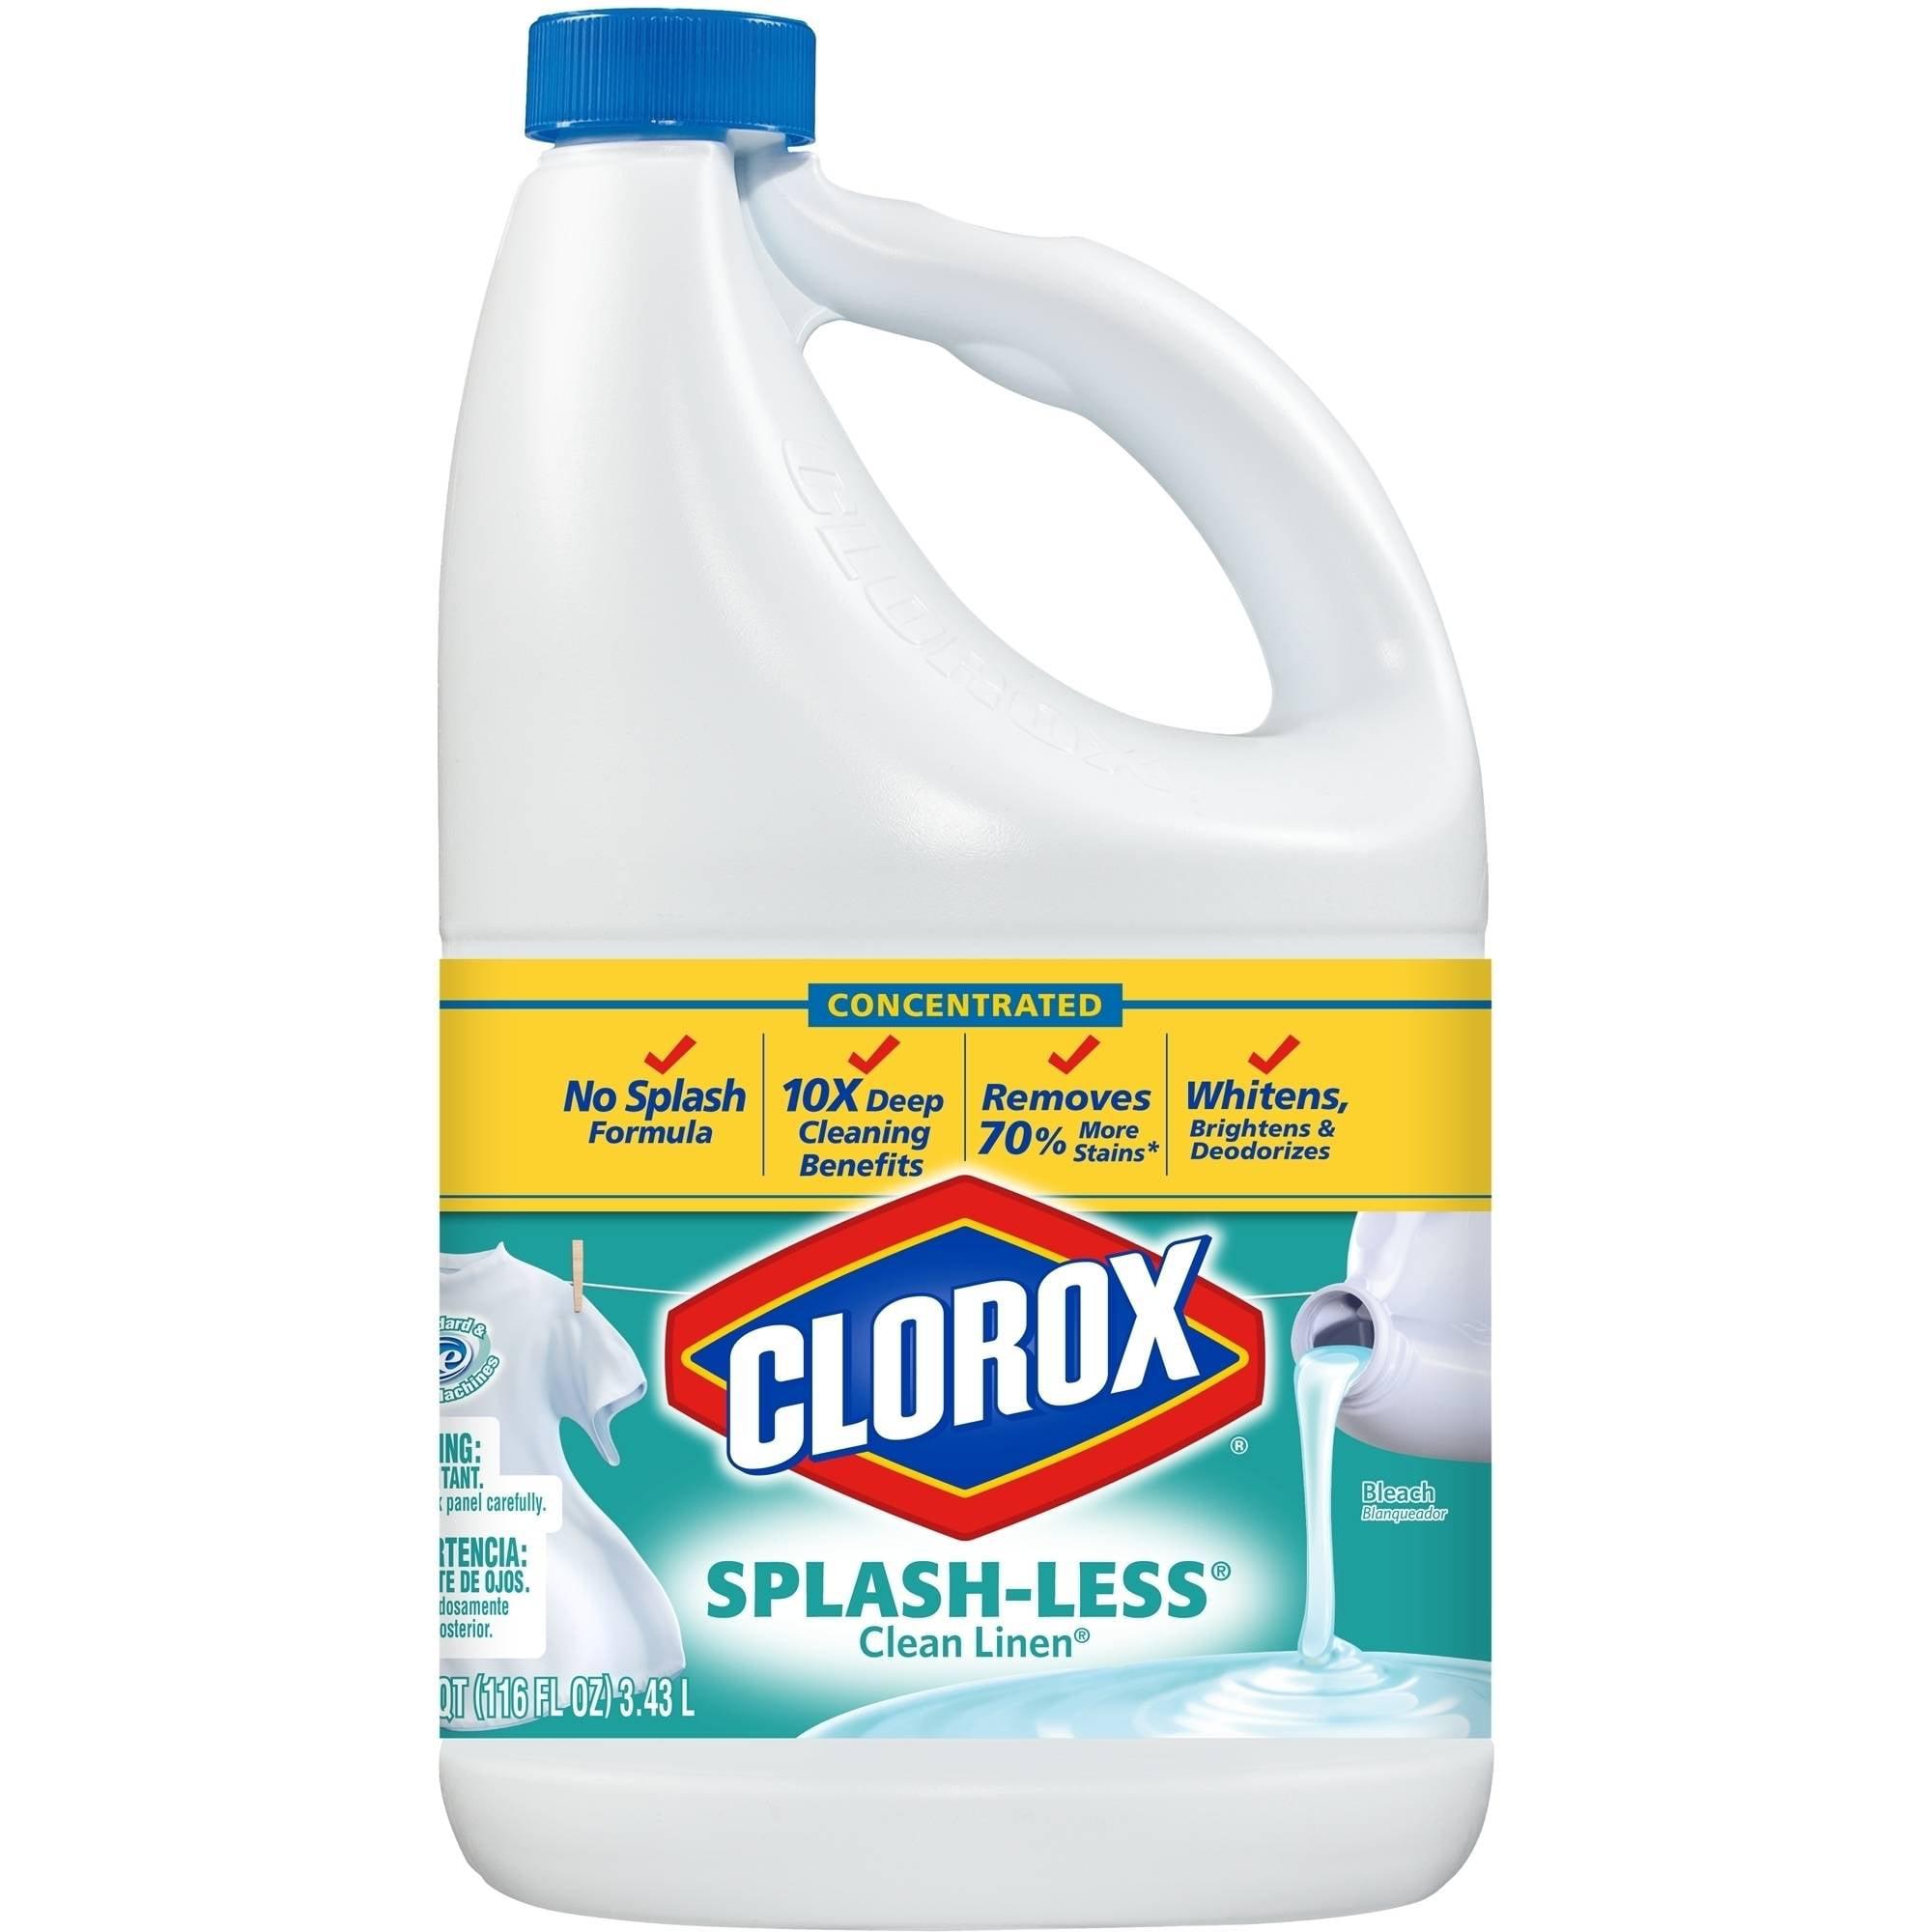 Clorox Splash-less Scented Bleach, Concentrated Clean Linen, 116 Fluid Ounces